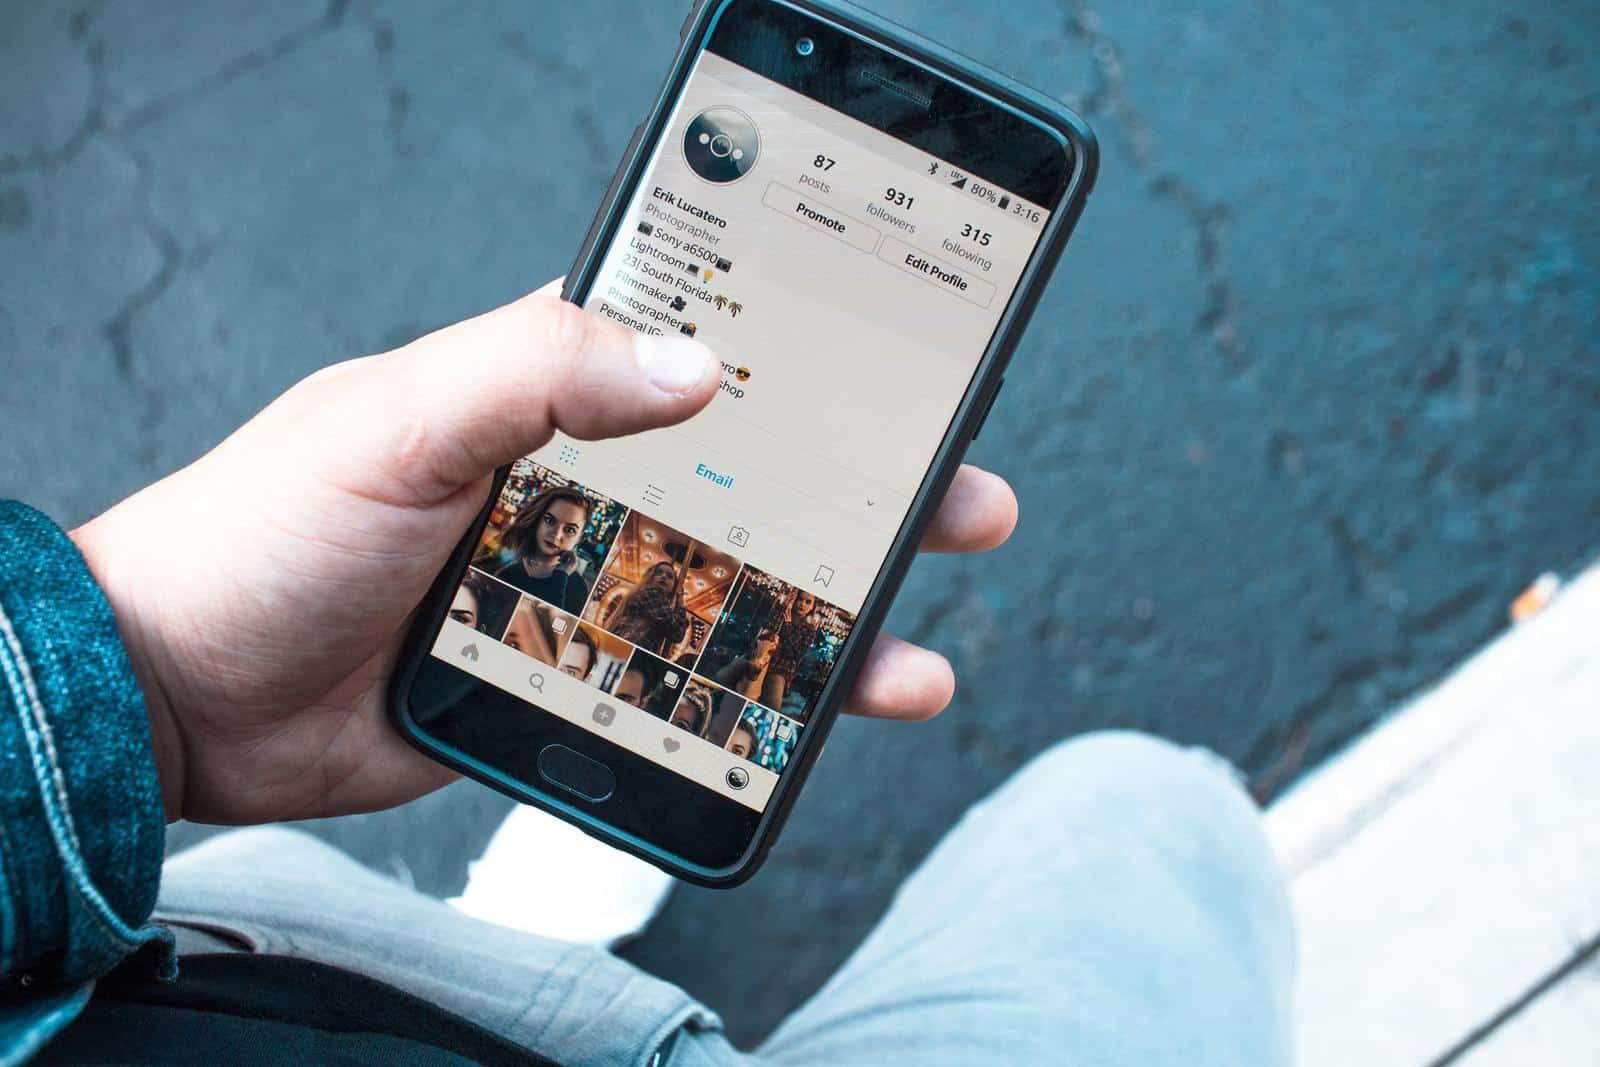 Man looking at Instagram profile